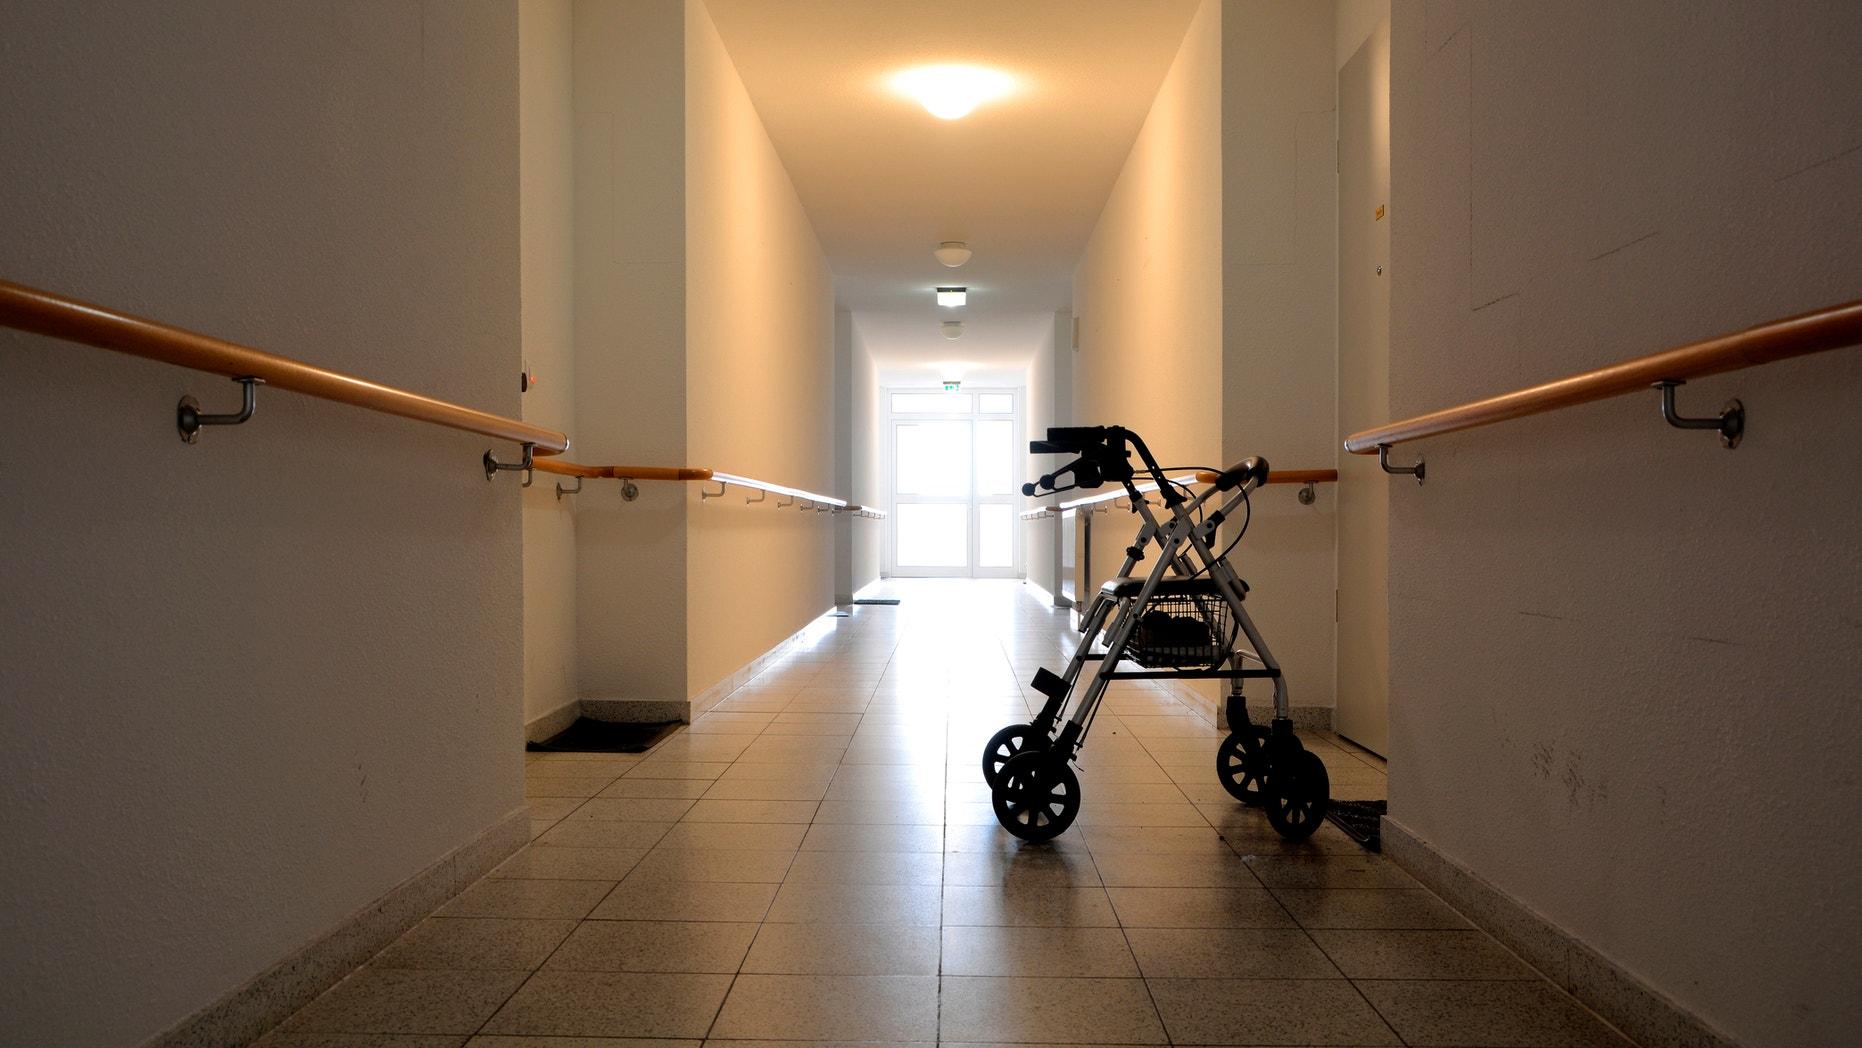 Corridor in a no longer exists nursing home in Magdeburg